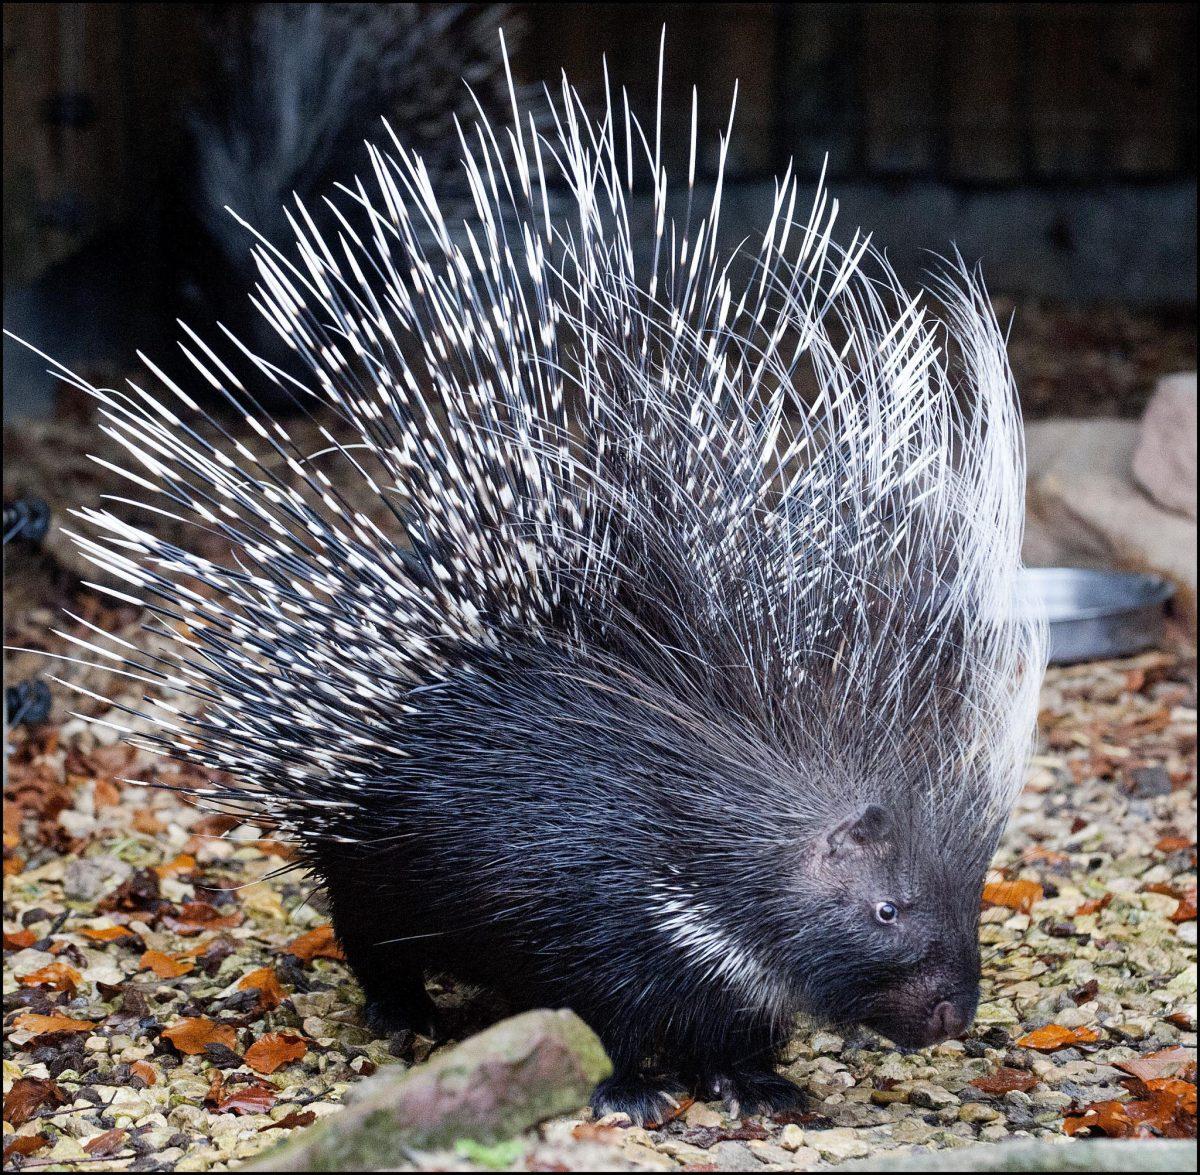 Porcupine ( South African / Cape Porcupine) - Dudley ...